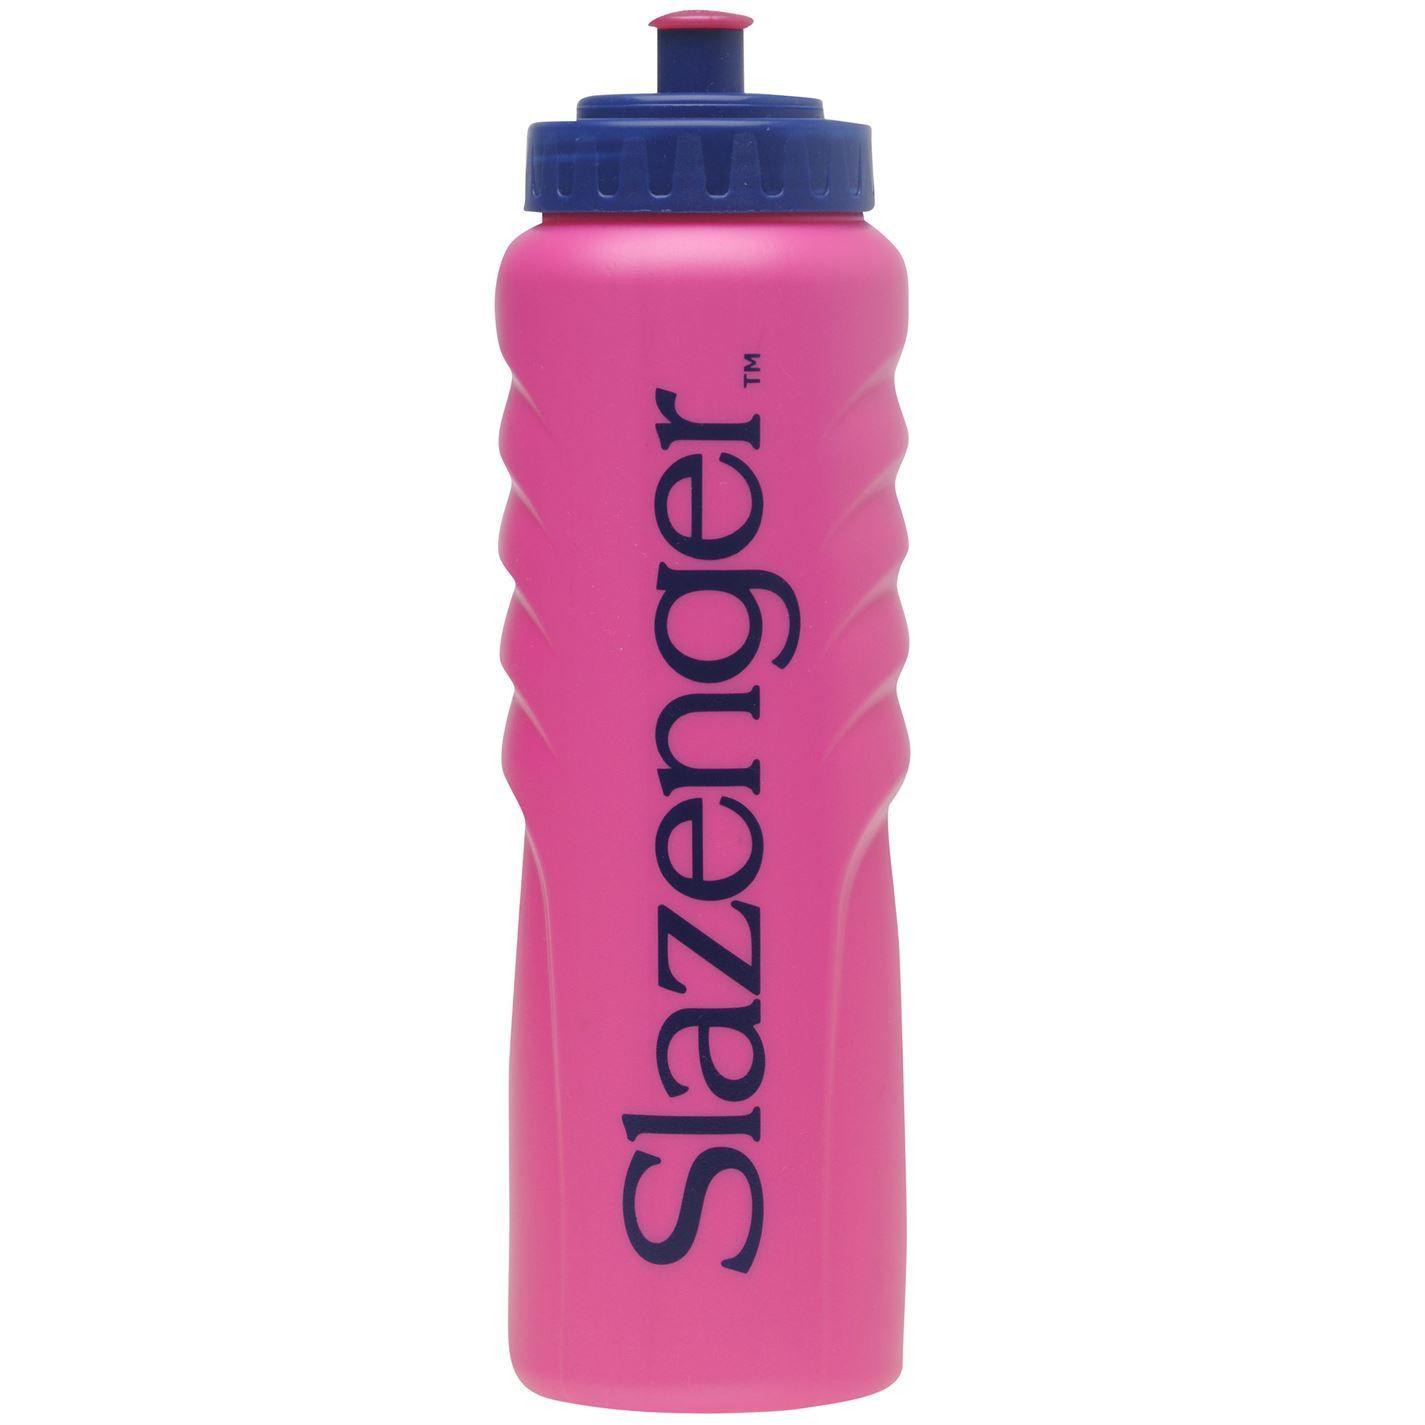 Slazenger Water bottle 500 ml Rs.150 only at @amazon